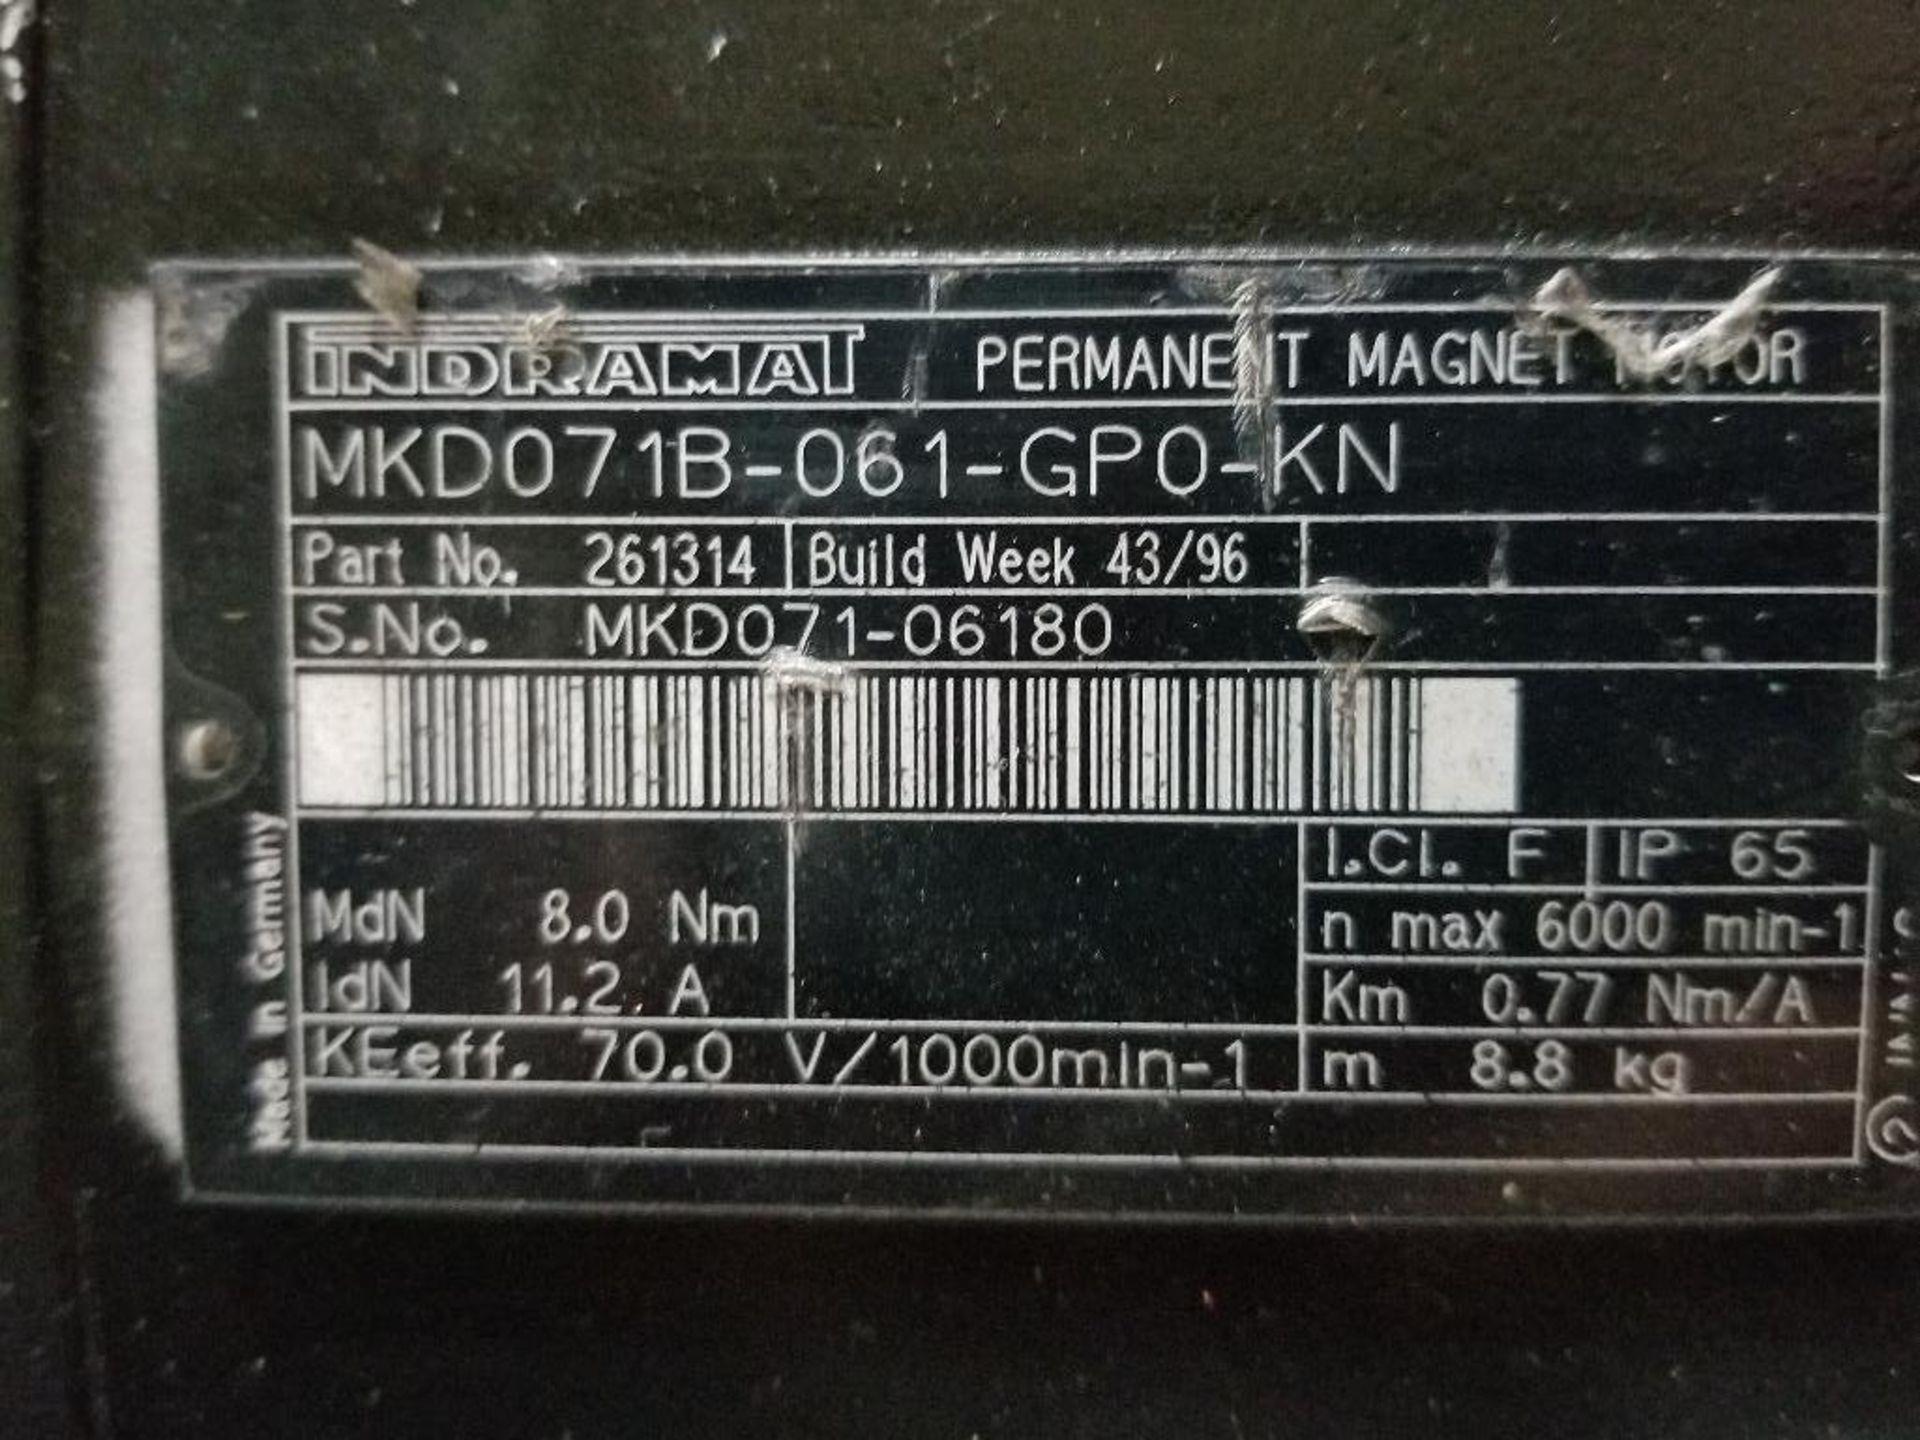 0.77kW Indramat permanent magnet motor. MKD071B-061-GP0-KN. - Image 3 of 4